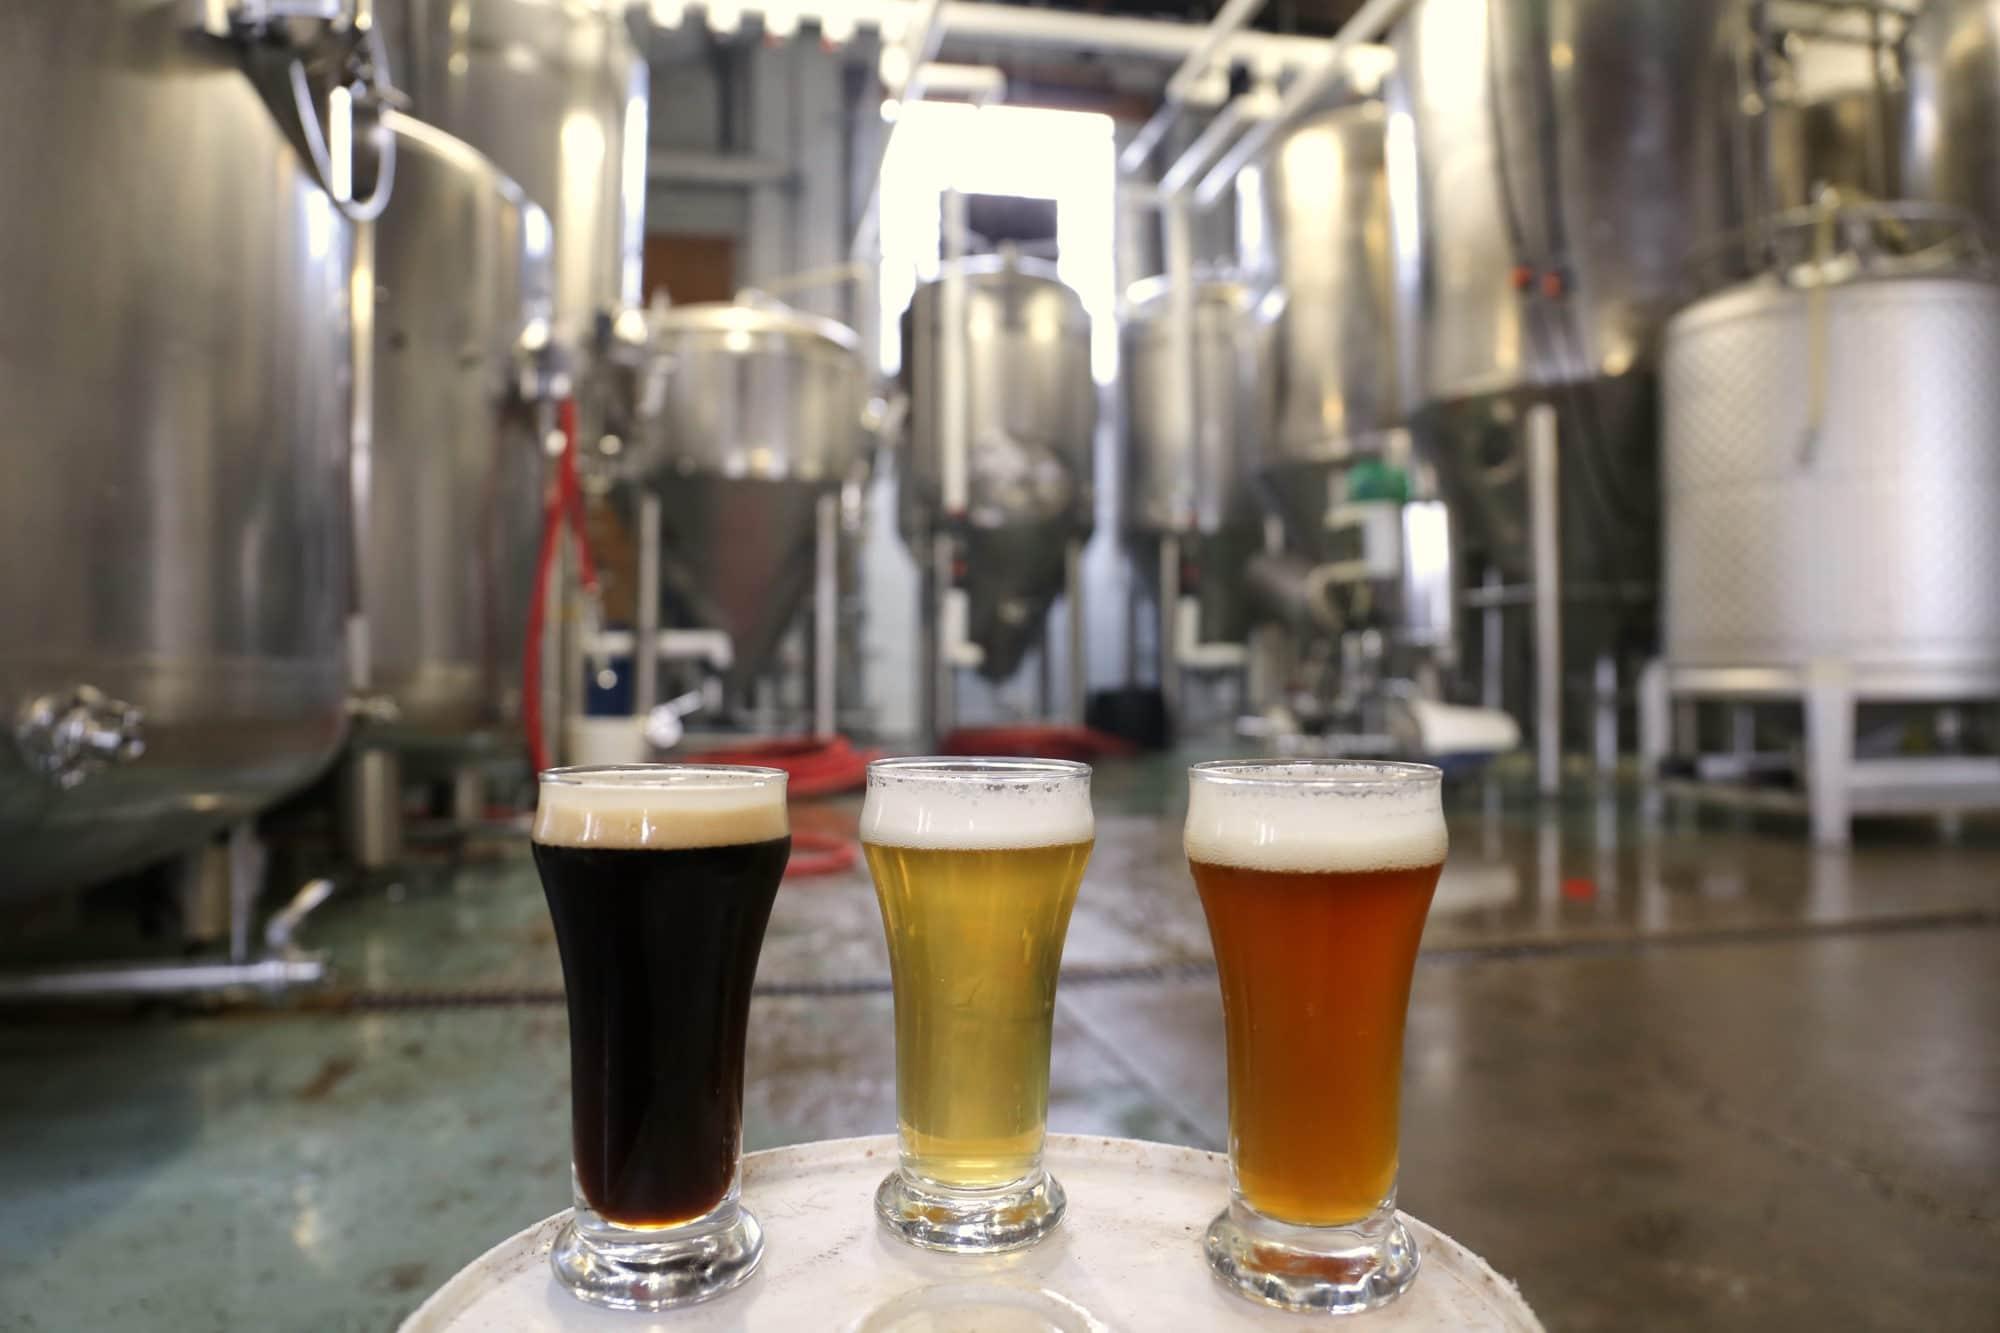 Kitchener Waterloo Breweries: Grand River Brewing